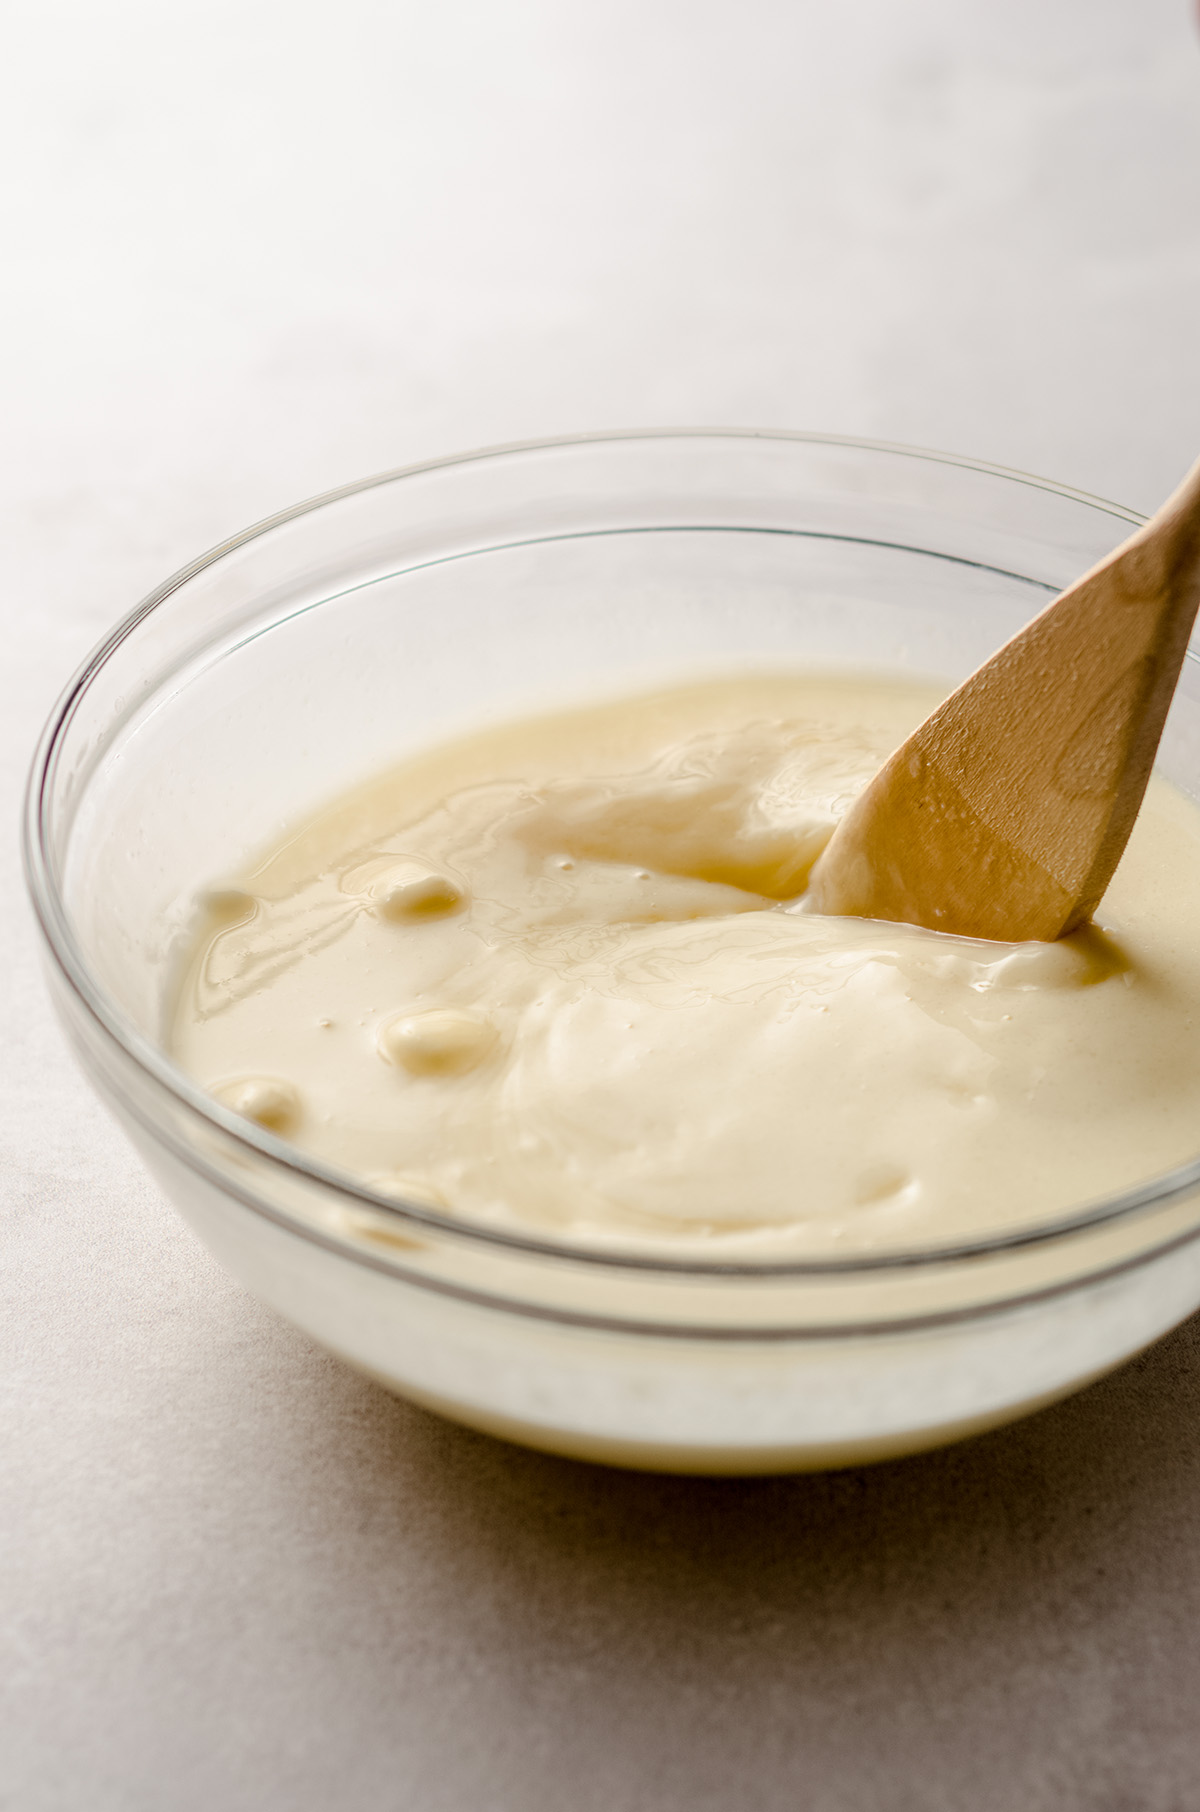 stirring lemon ganache with a spoon